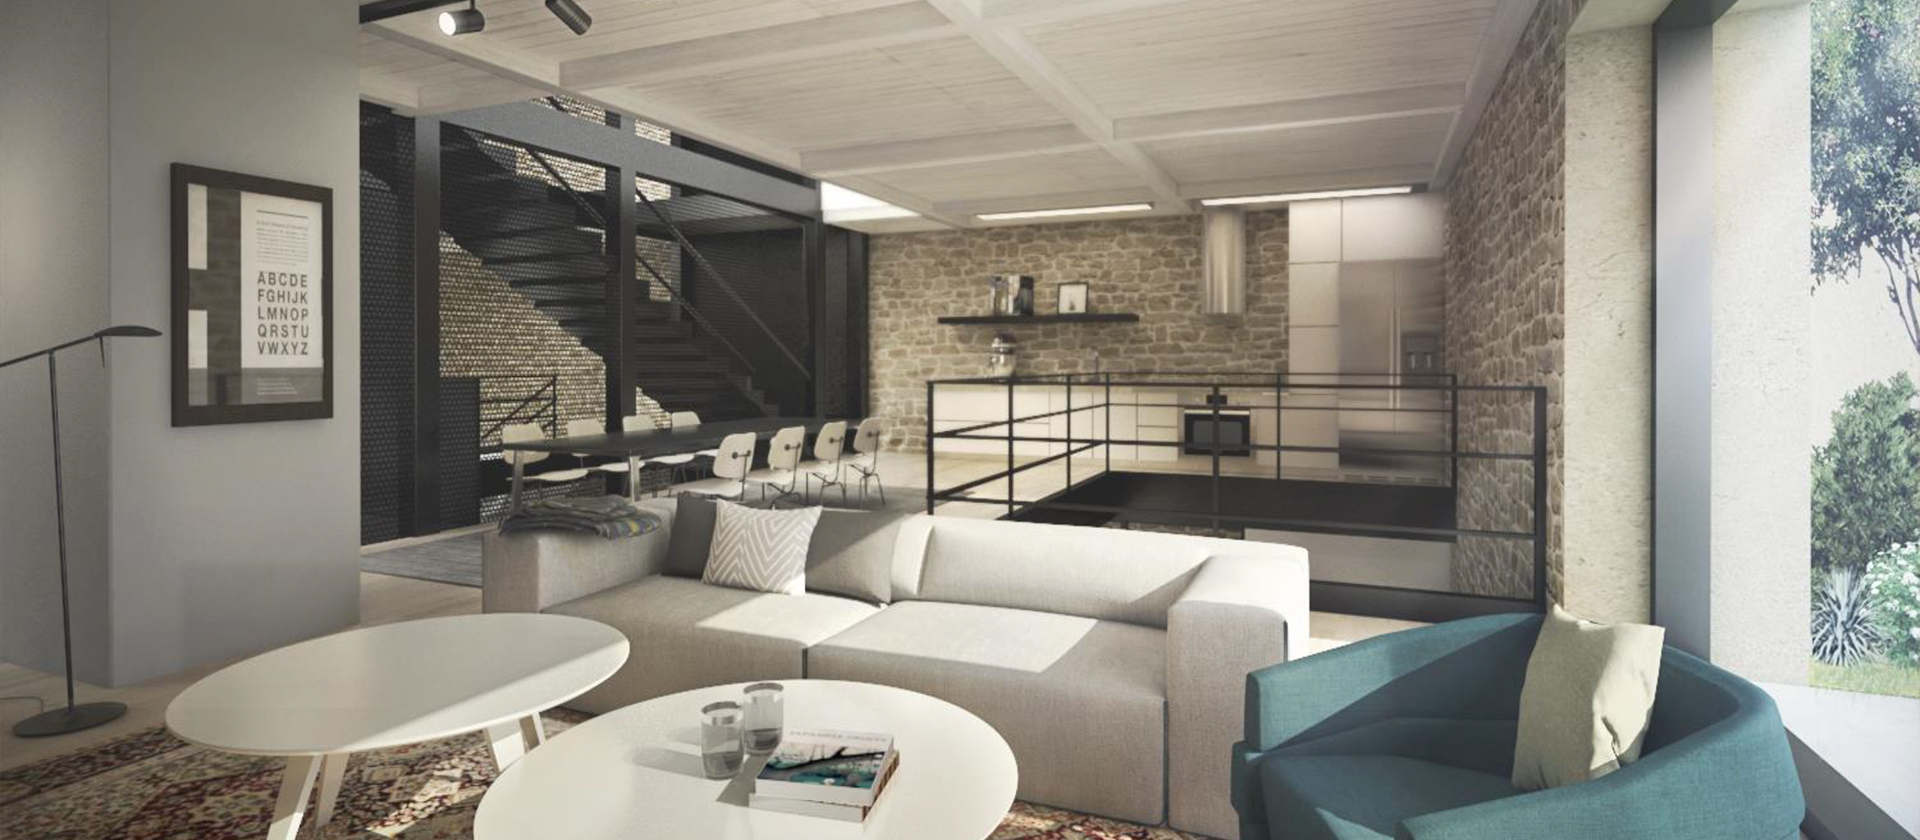 FIDI, Interior Design Courses In Florence, Italy. An International School  Of Interior Design